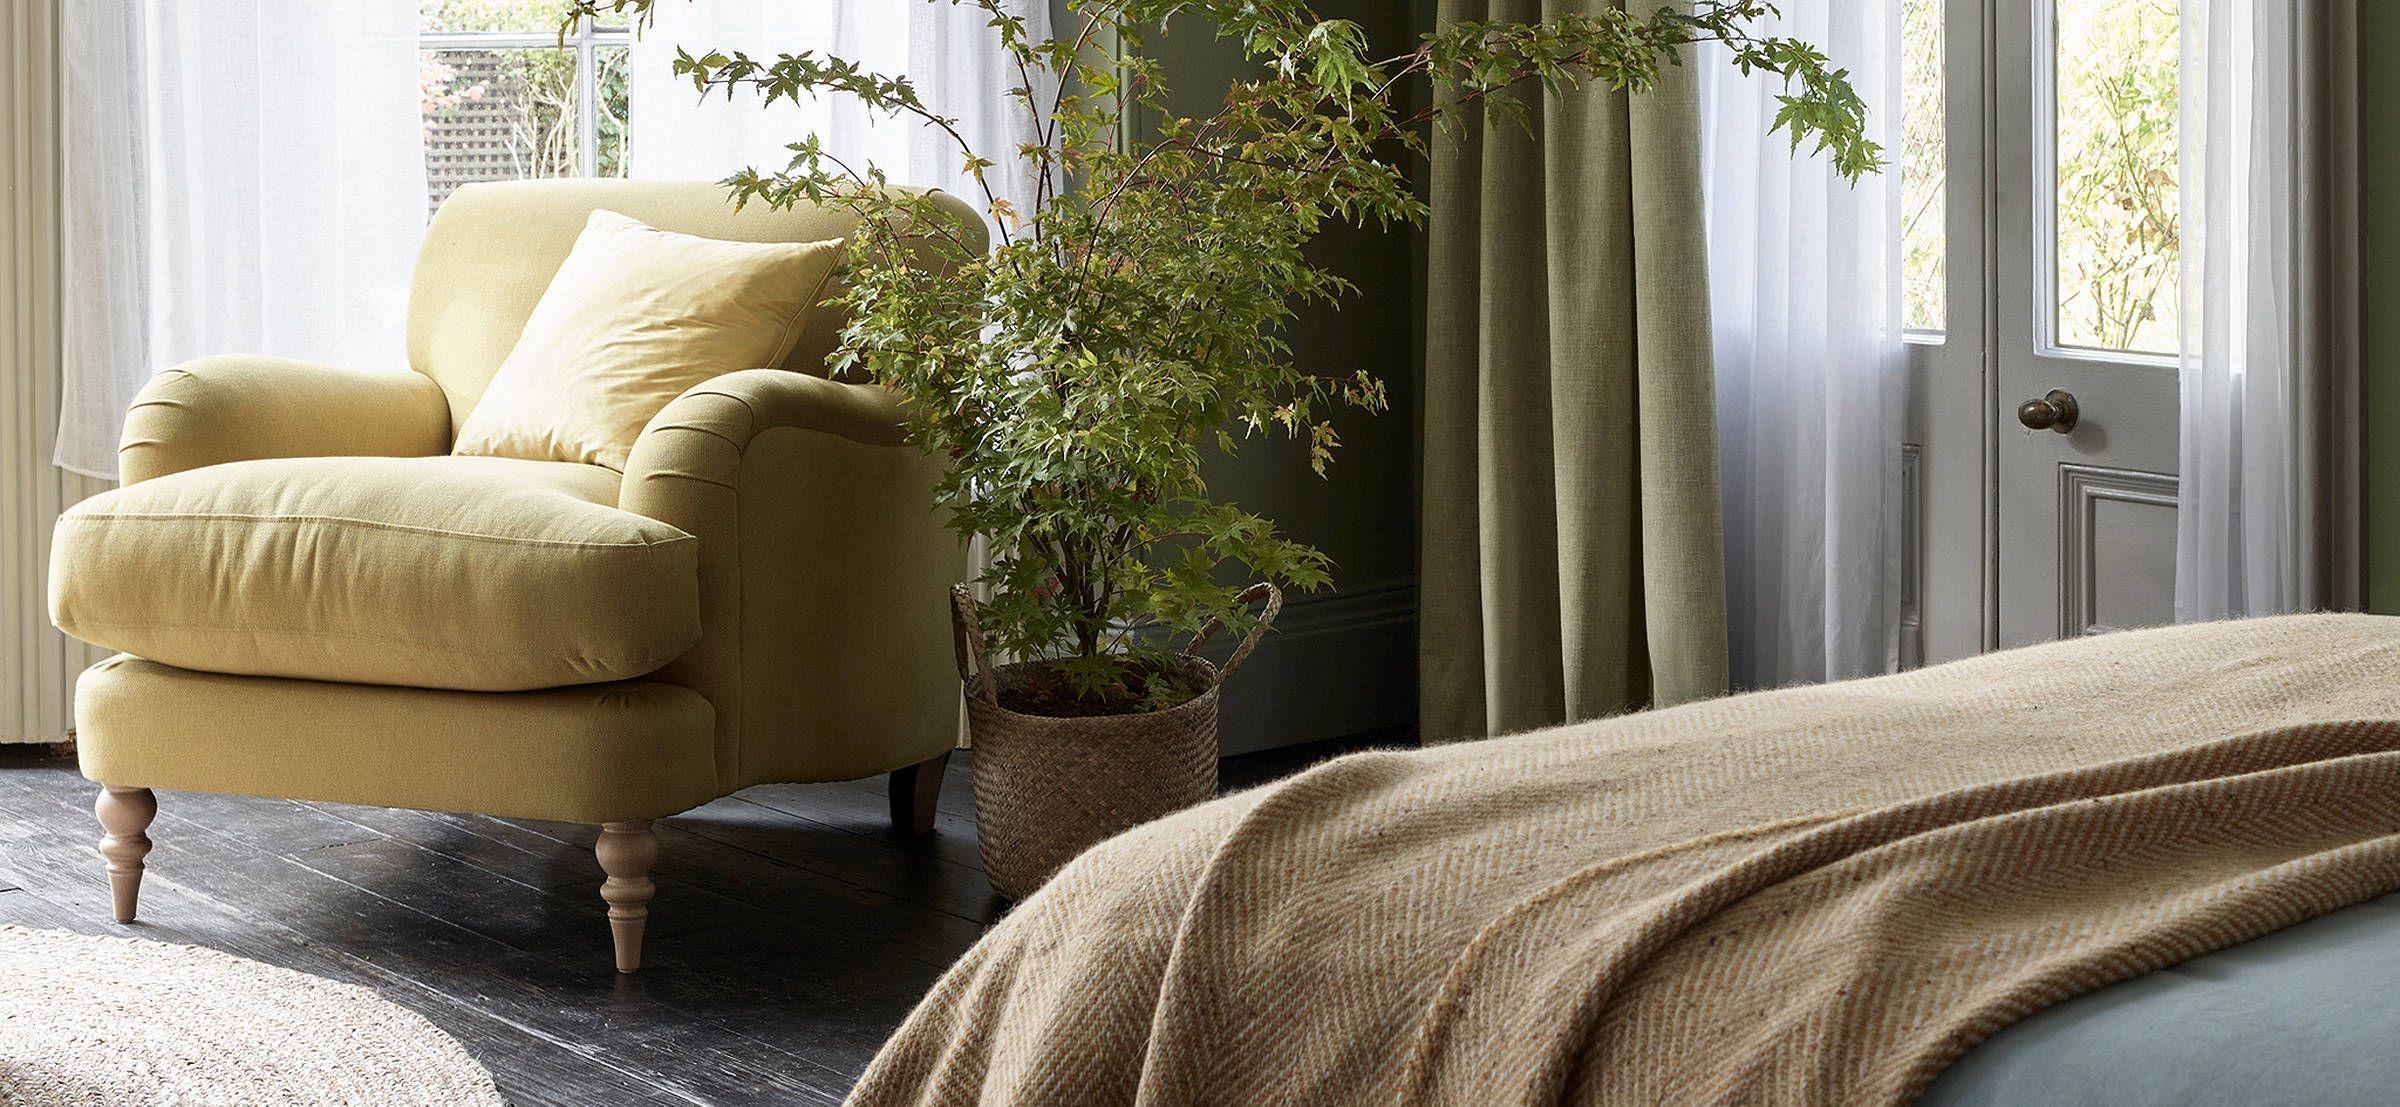 Design Your Own Sofas & Armchairs #designyourownbedroom | Bedroom ...